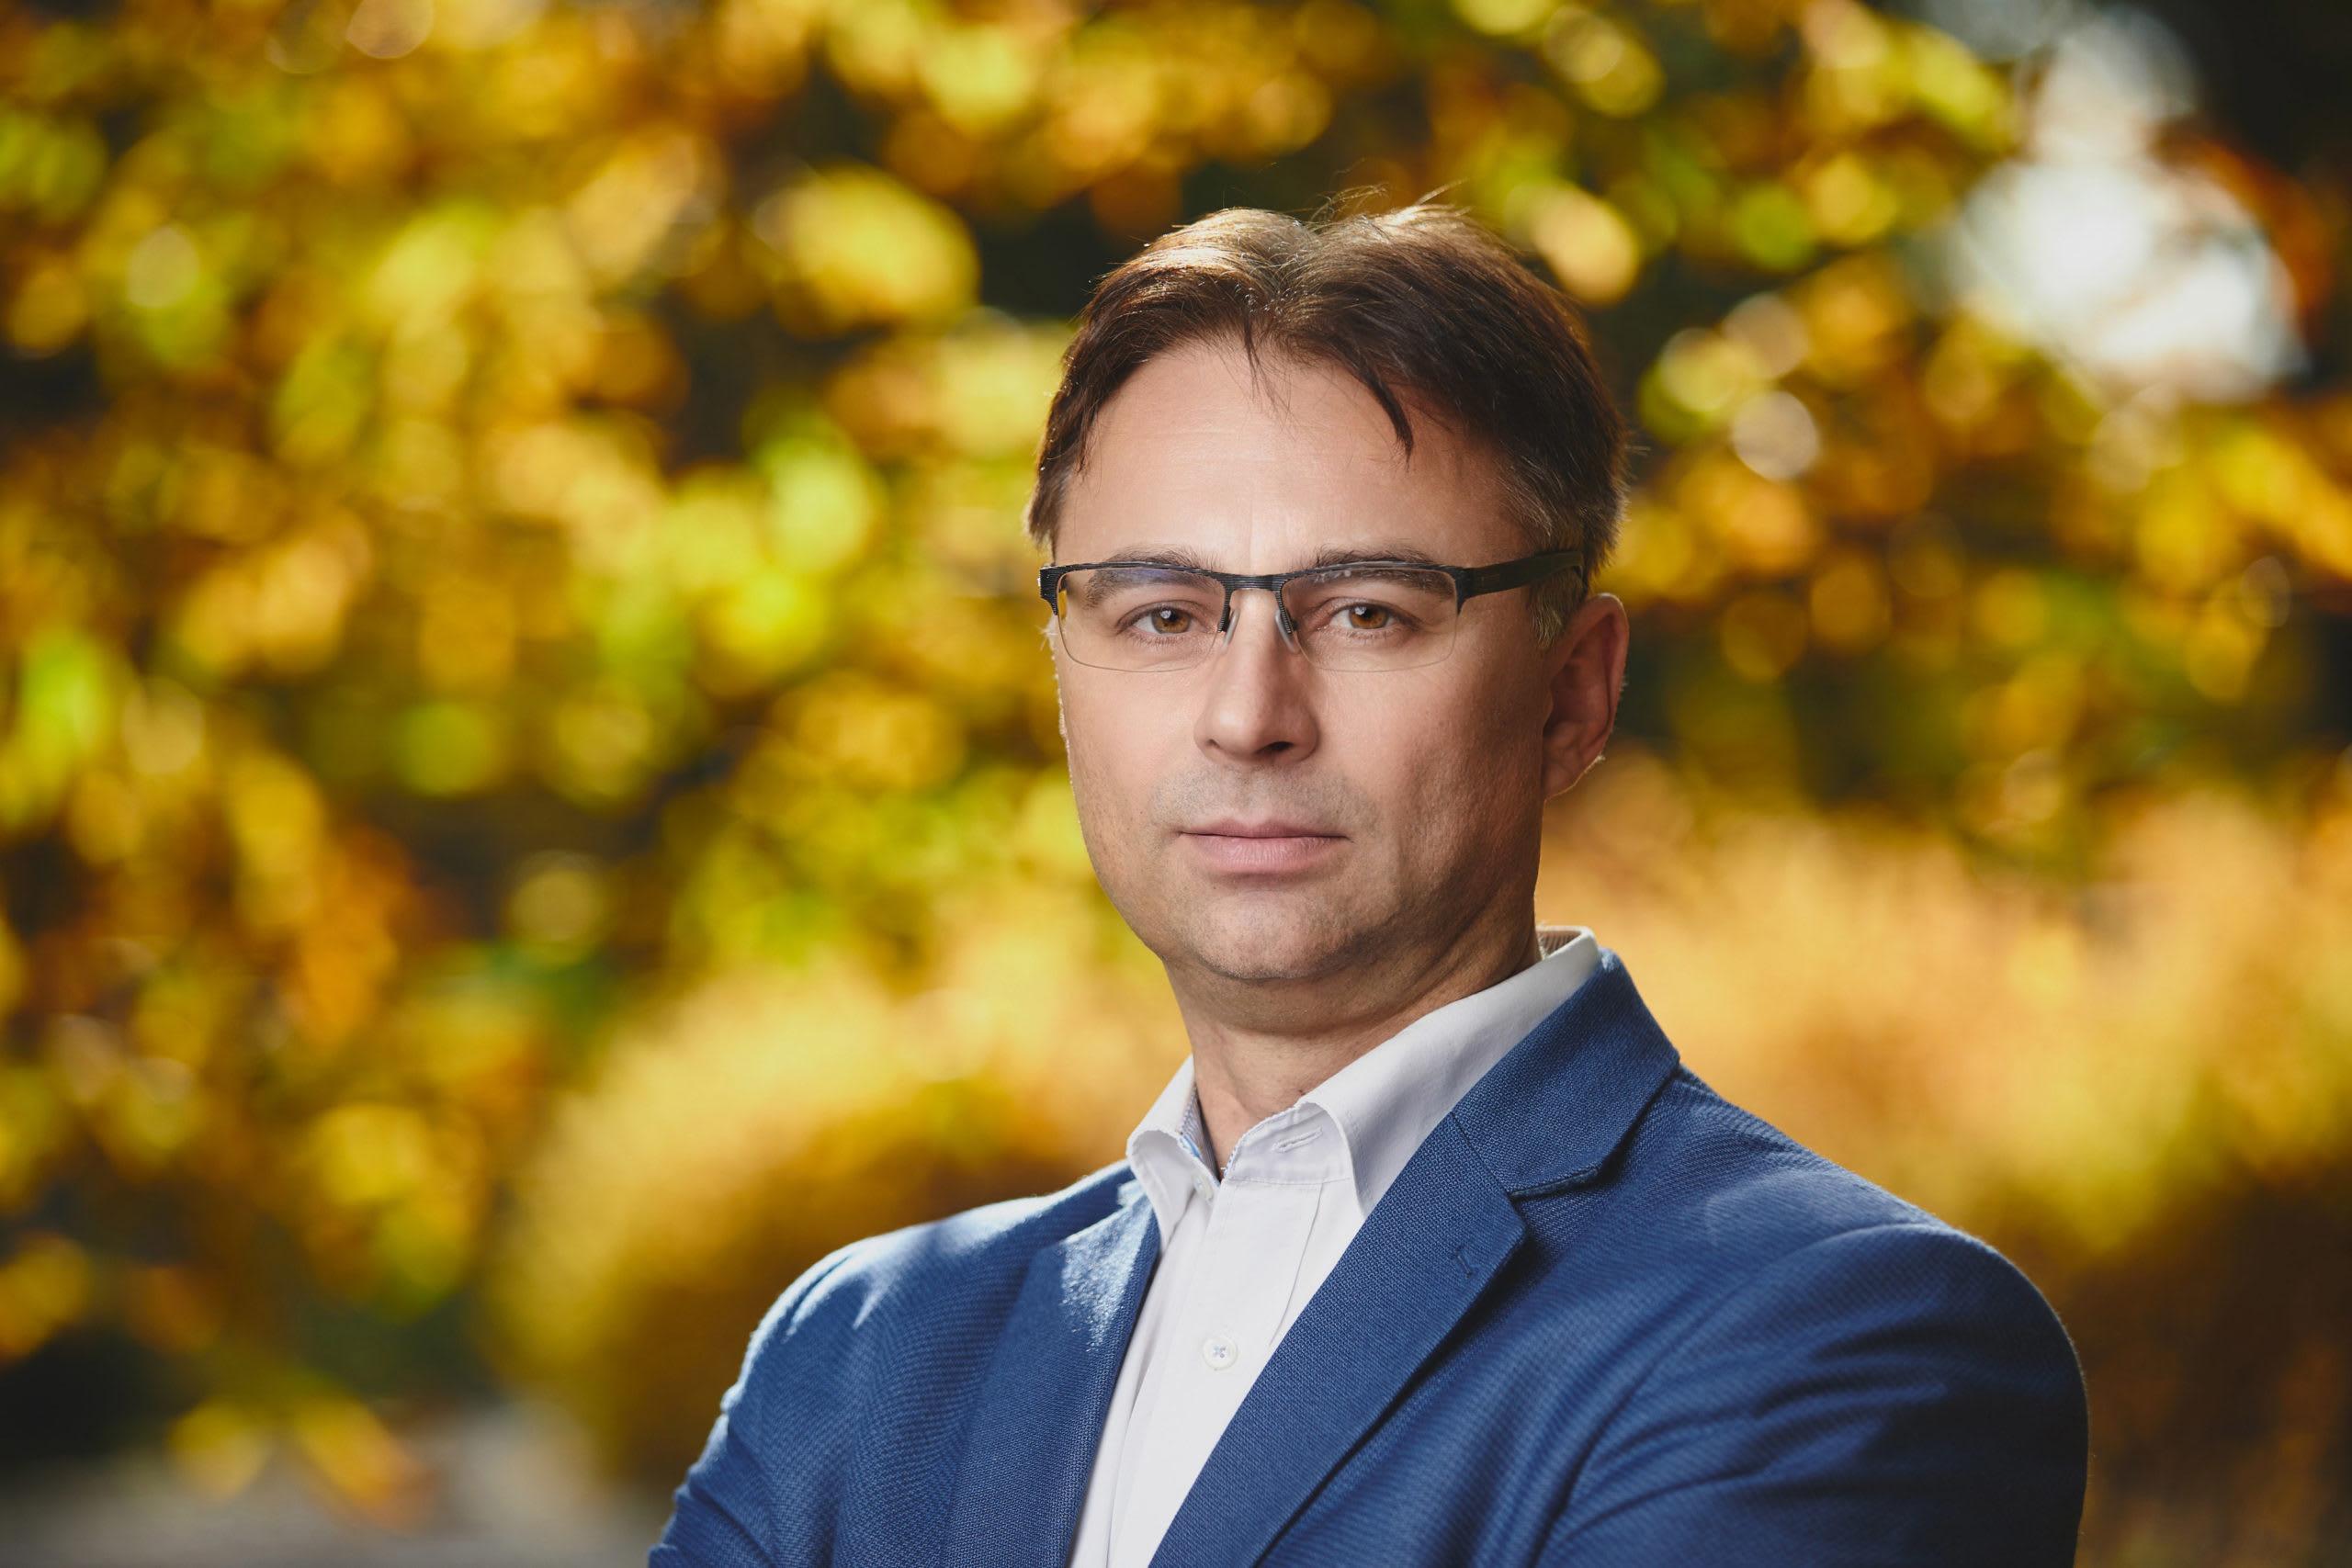 Piotr Jamski